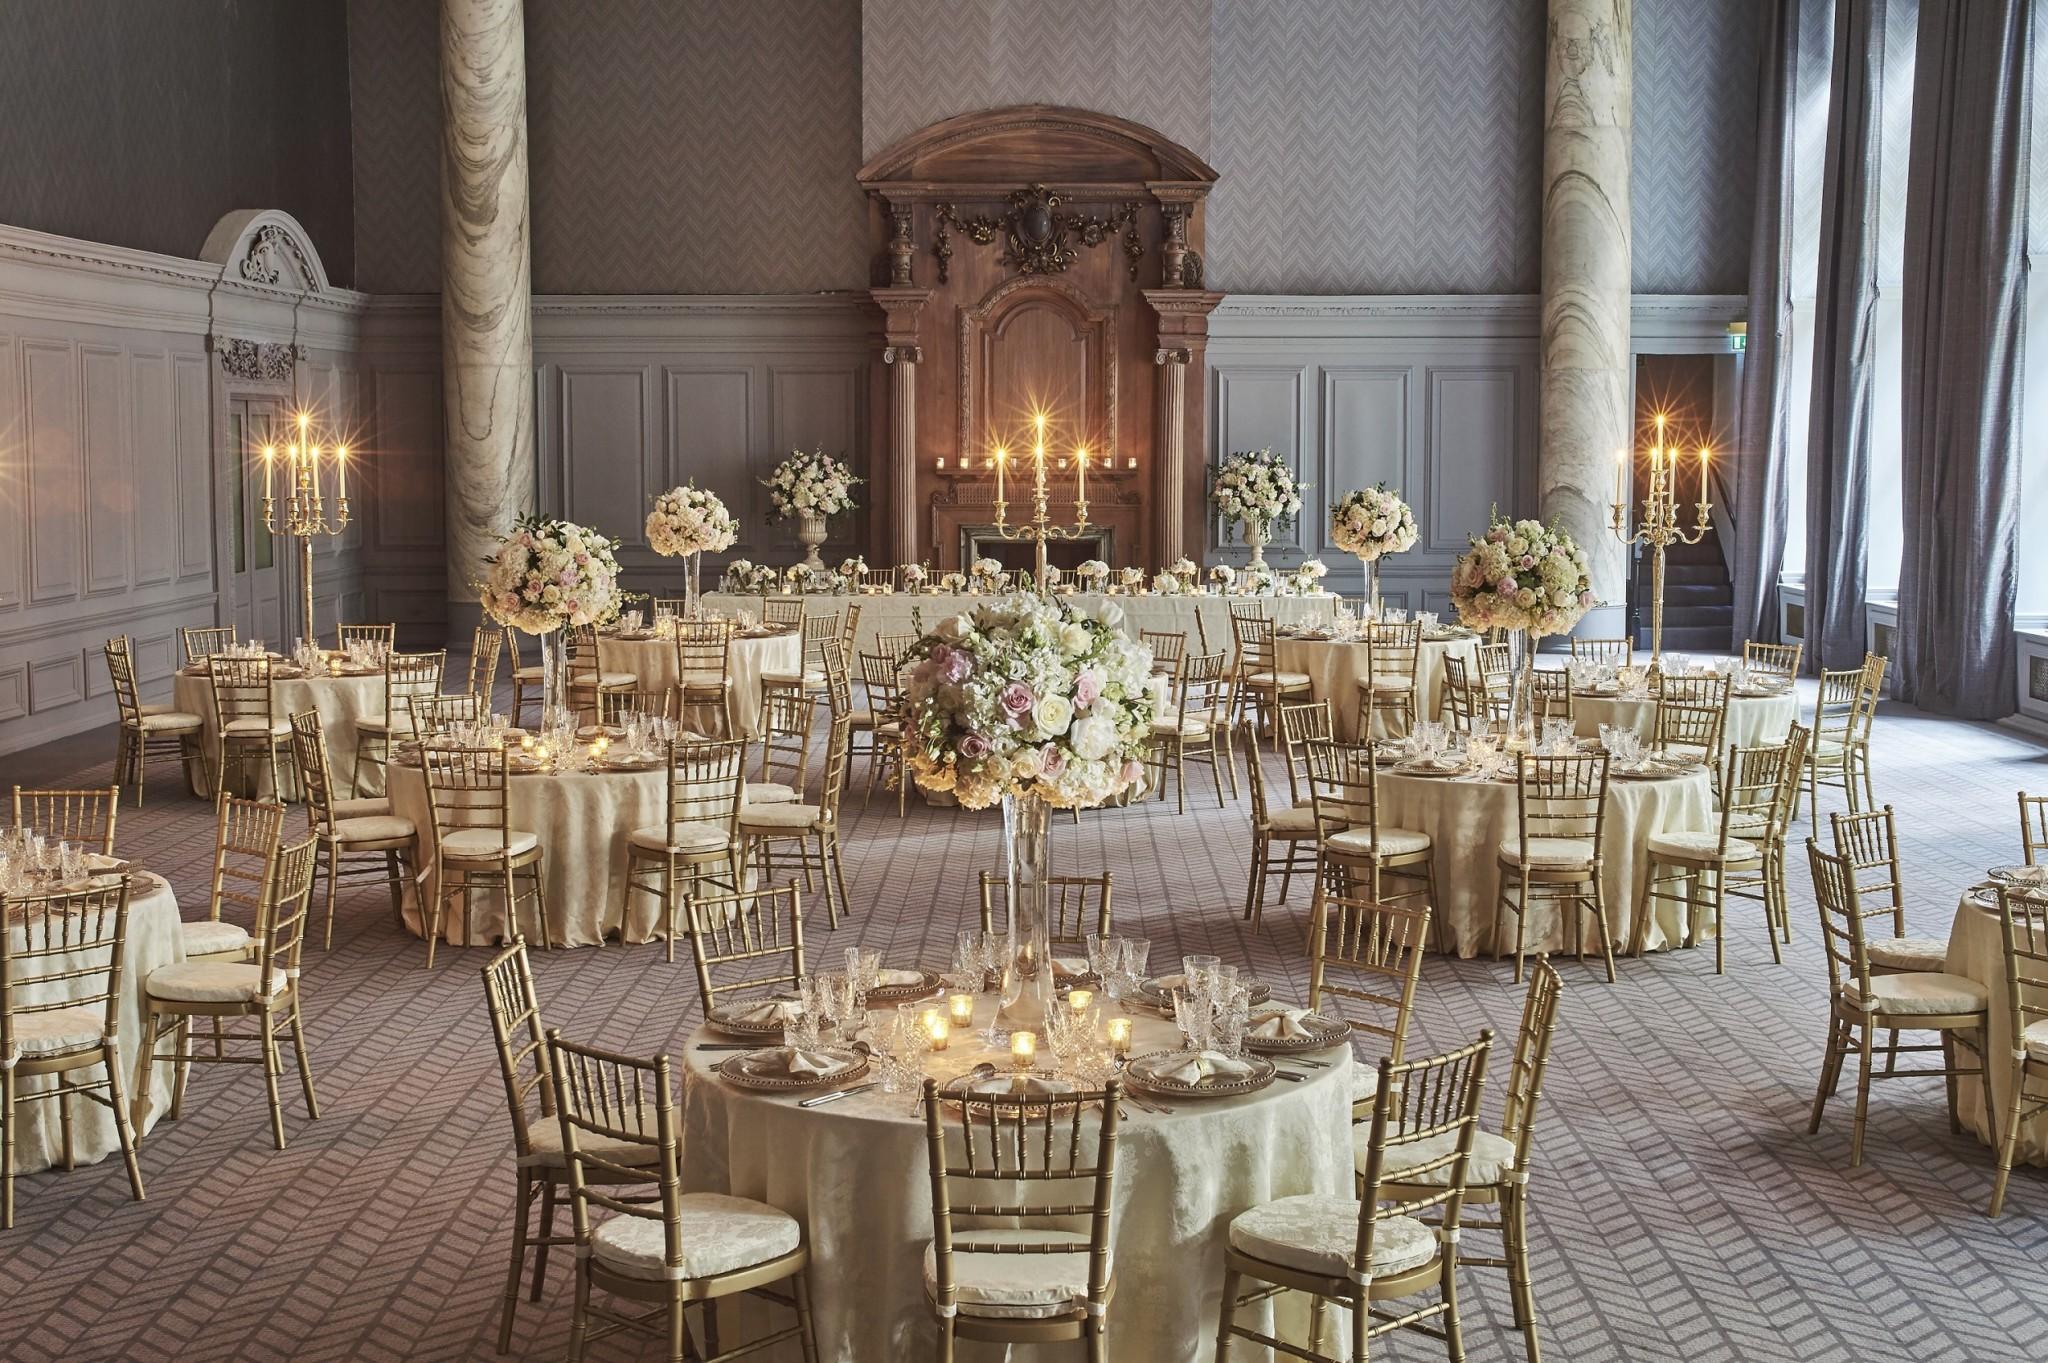 Grand Central Hotel CH_Ballroom_Dinner 1